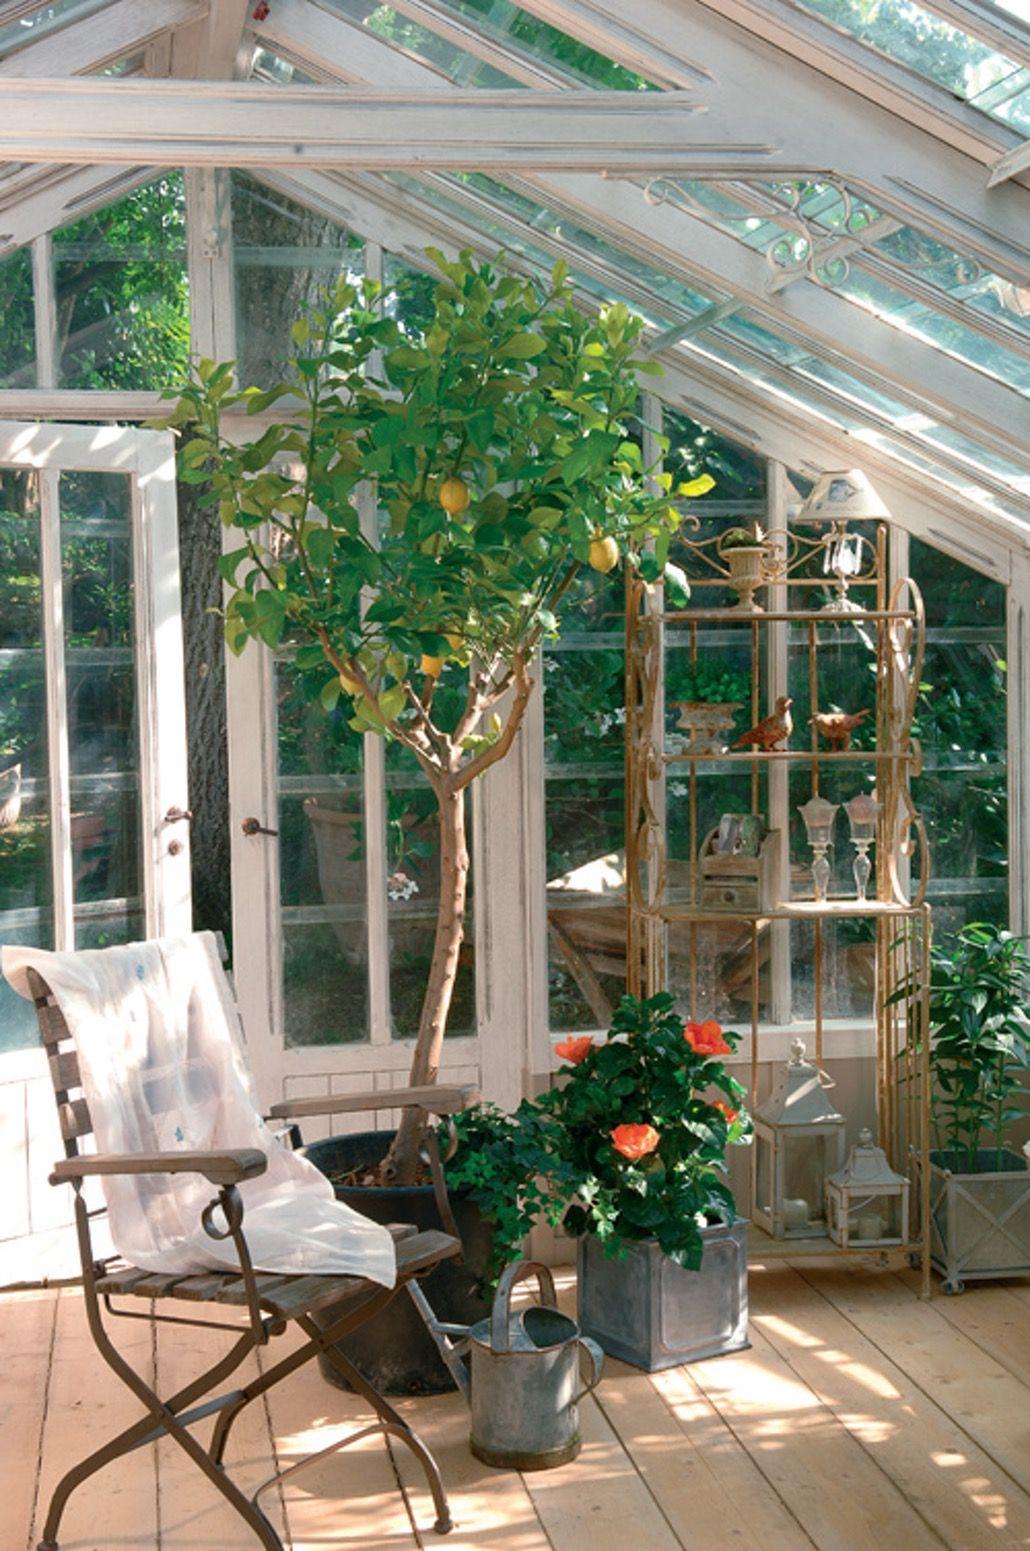 Giardino D Inverno In Vetro dans mon jardin d'hiver | giardino d'inverno, giardino di